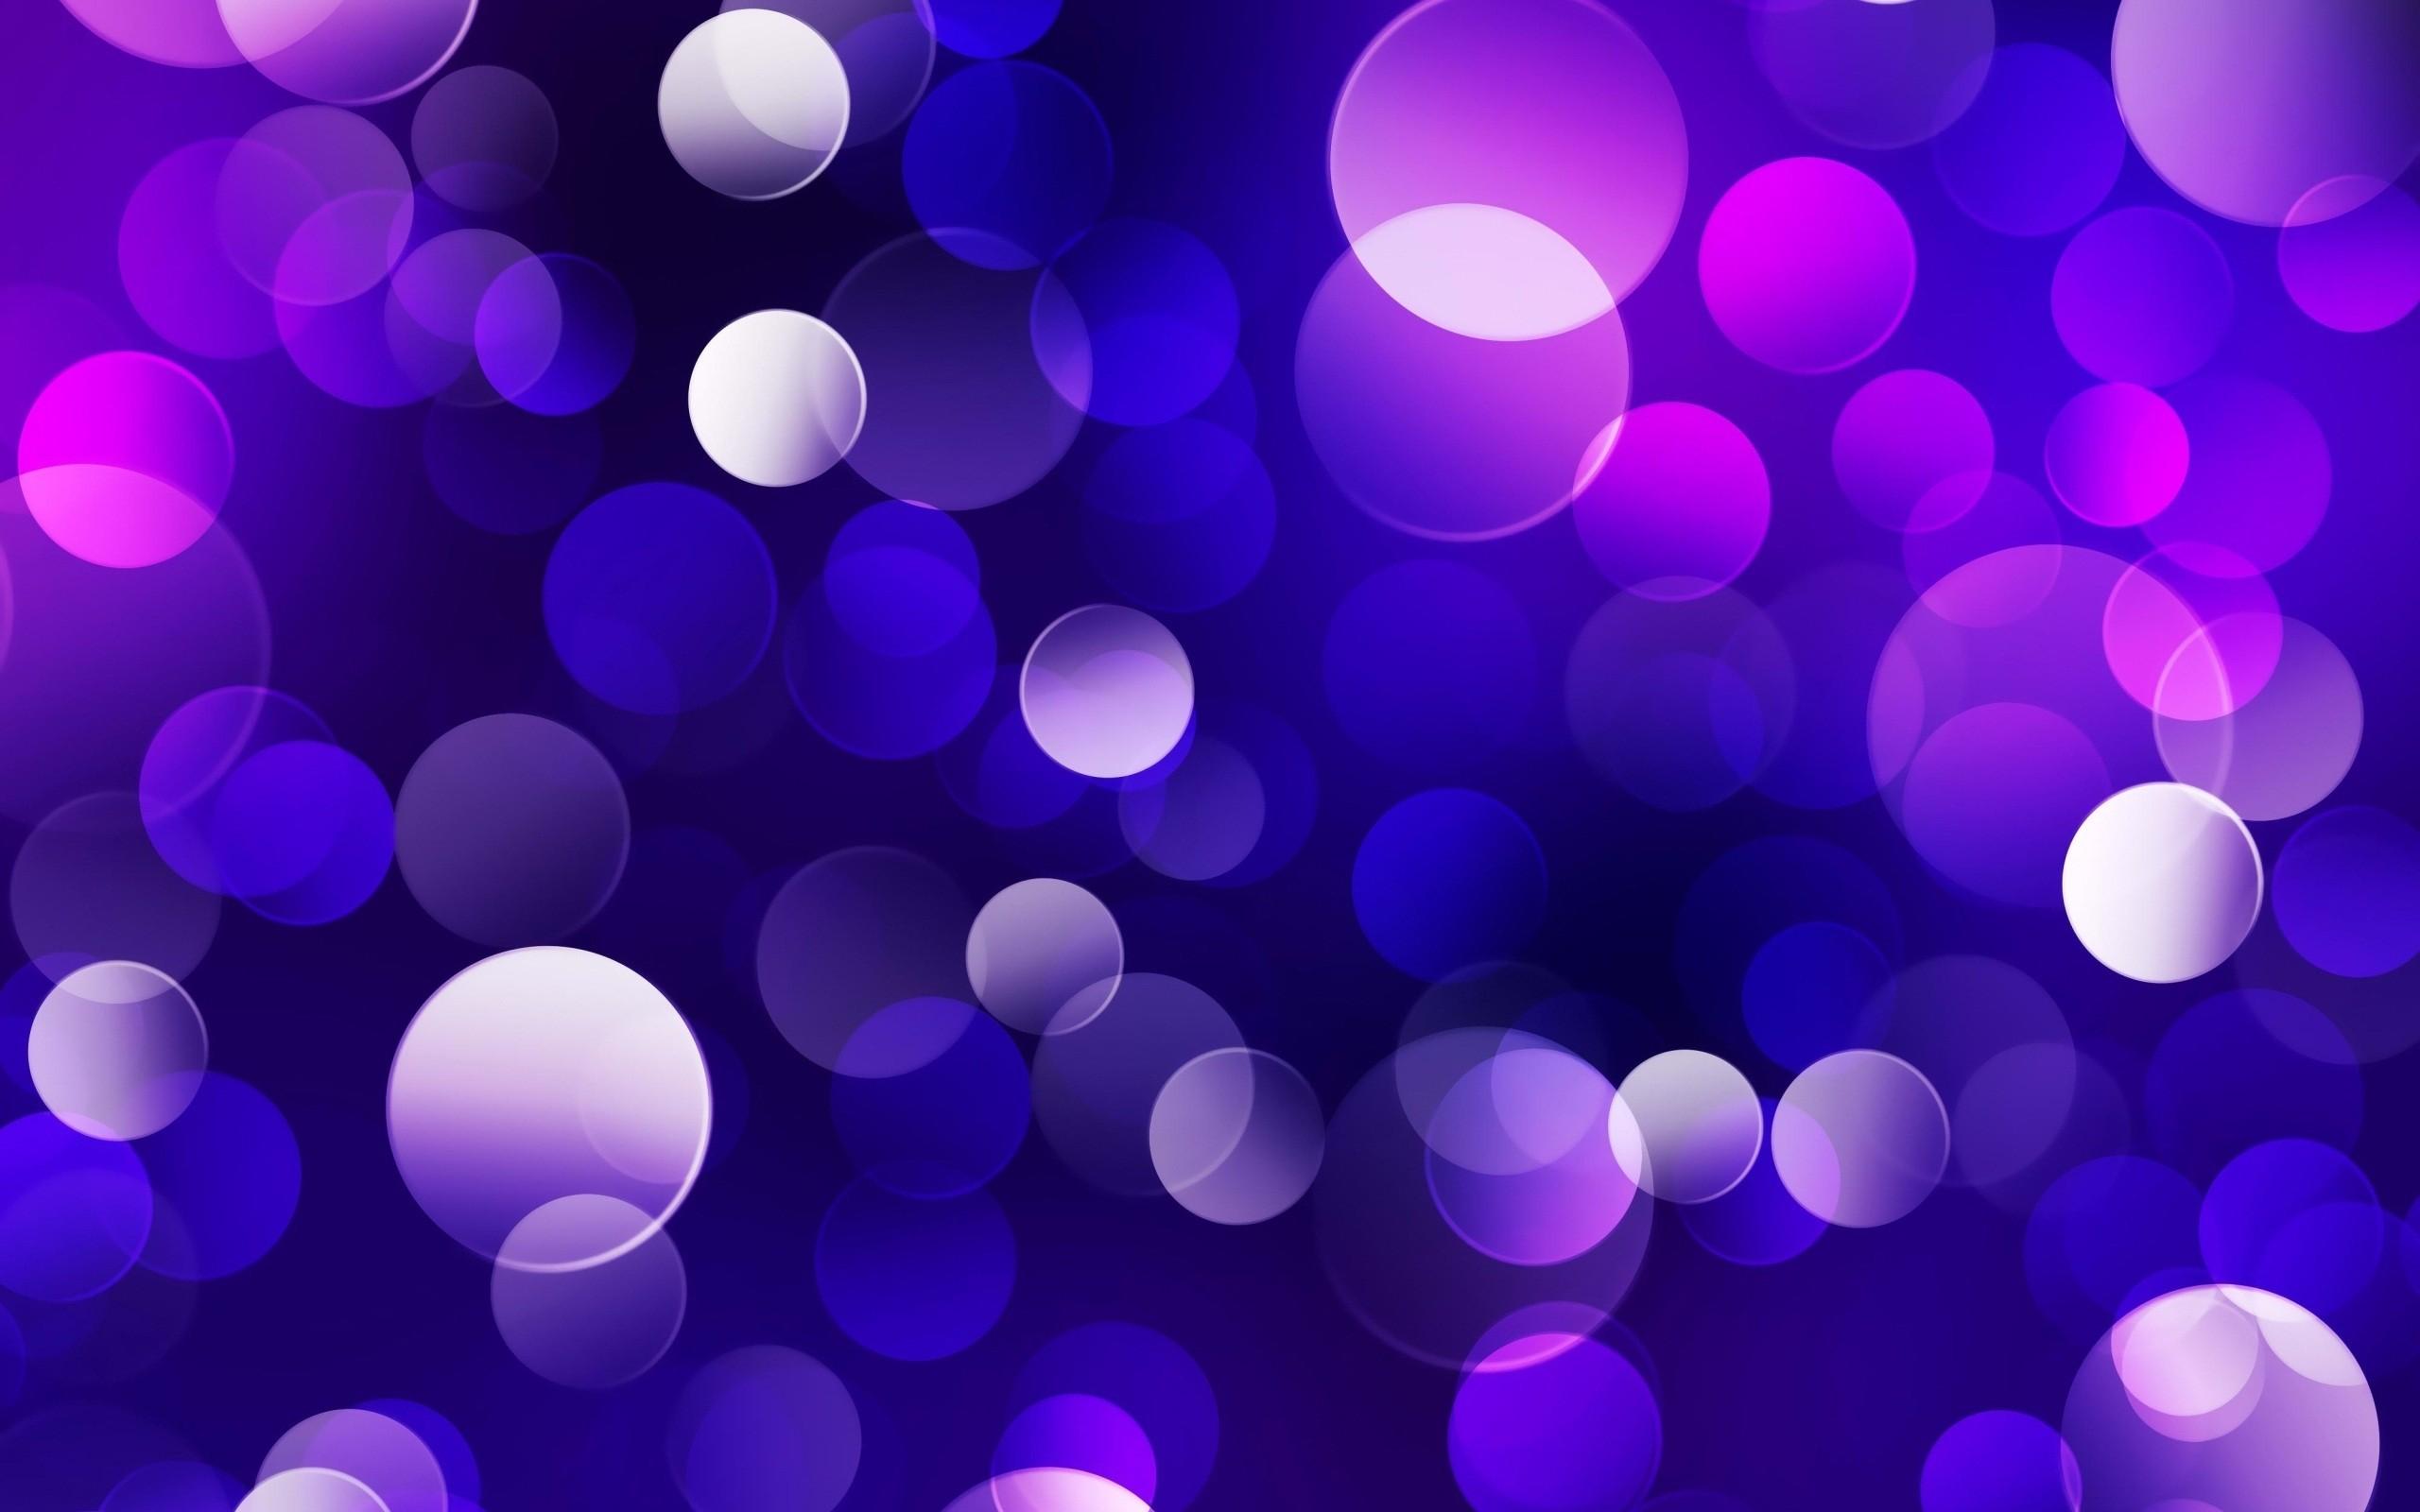 Purple Background 18533 px ~ HDWallSource.